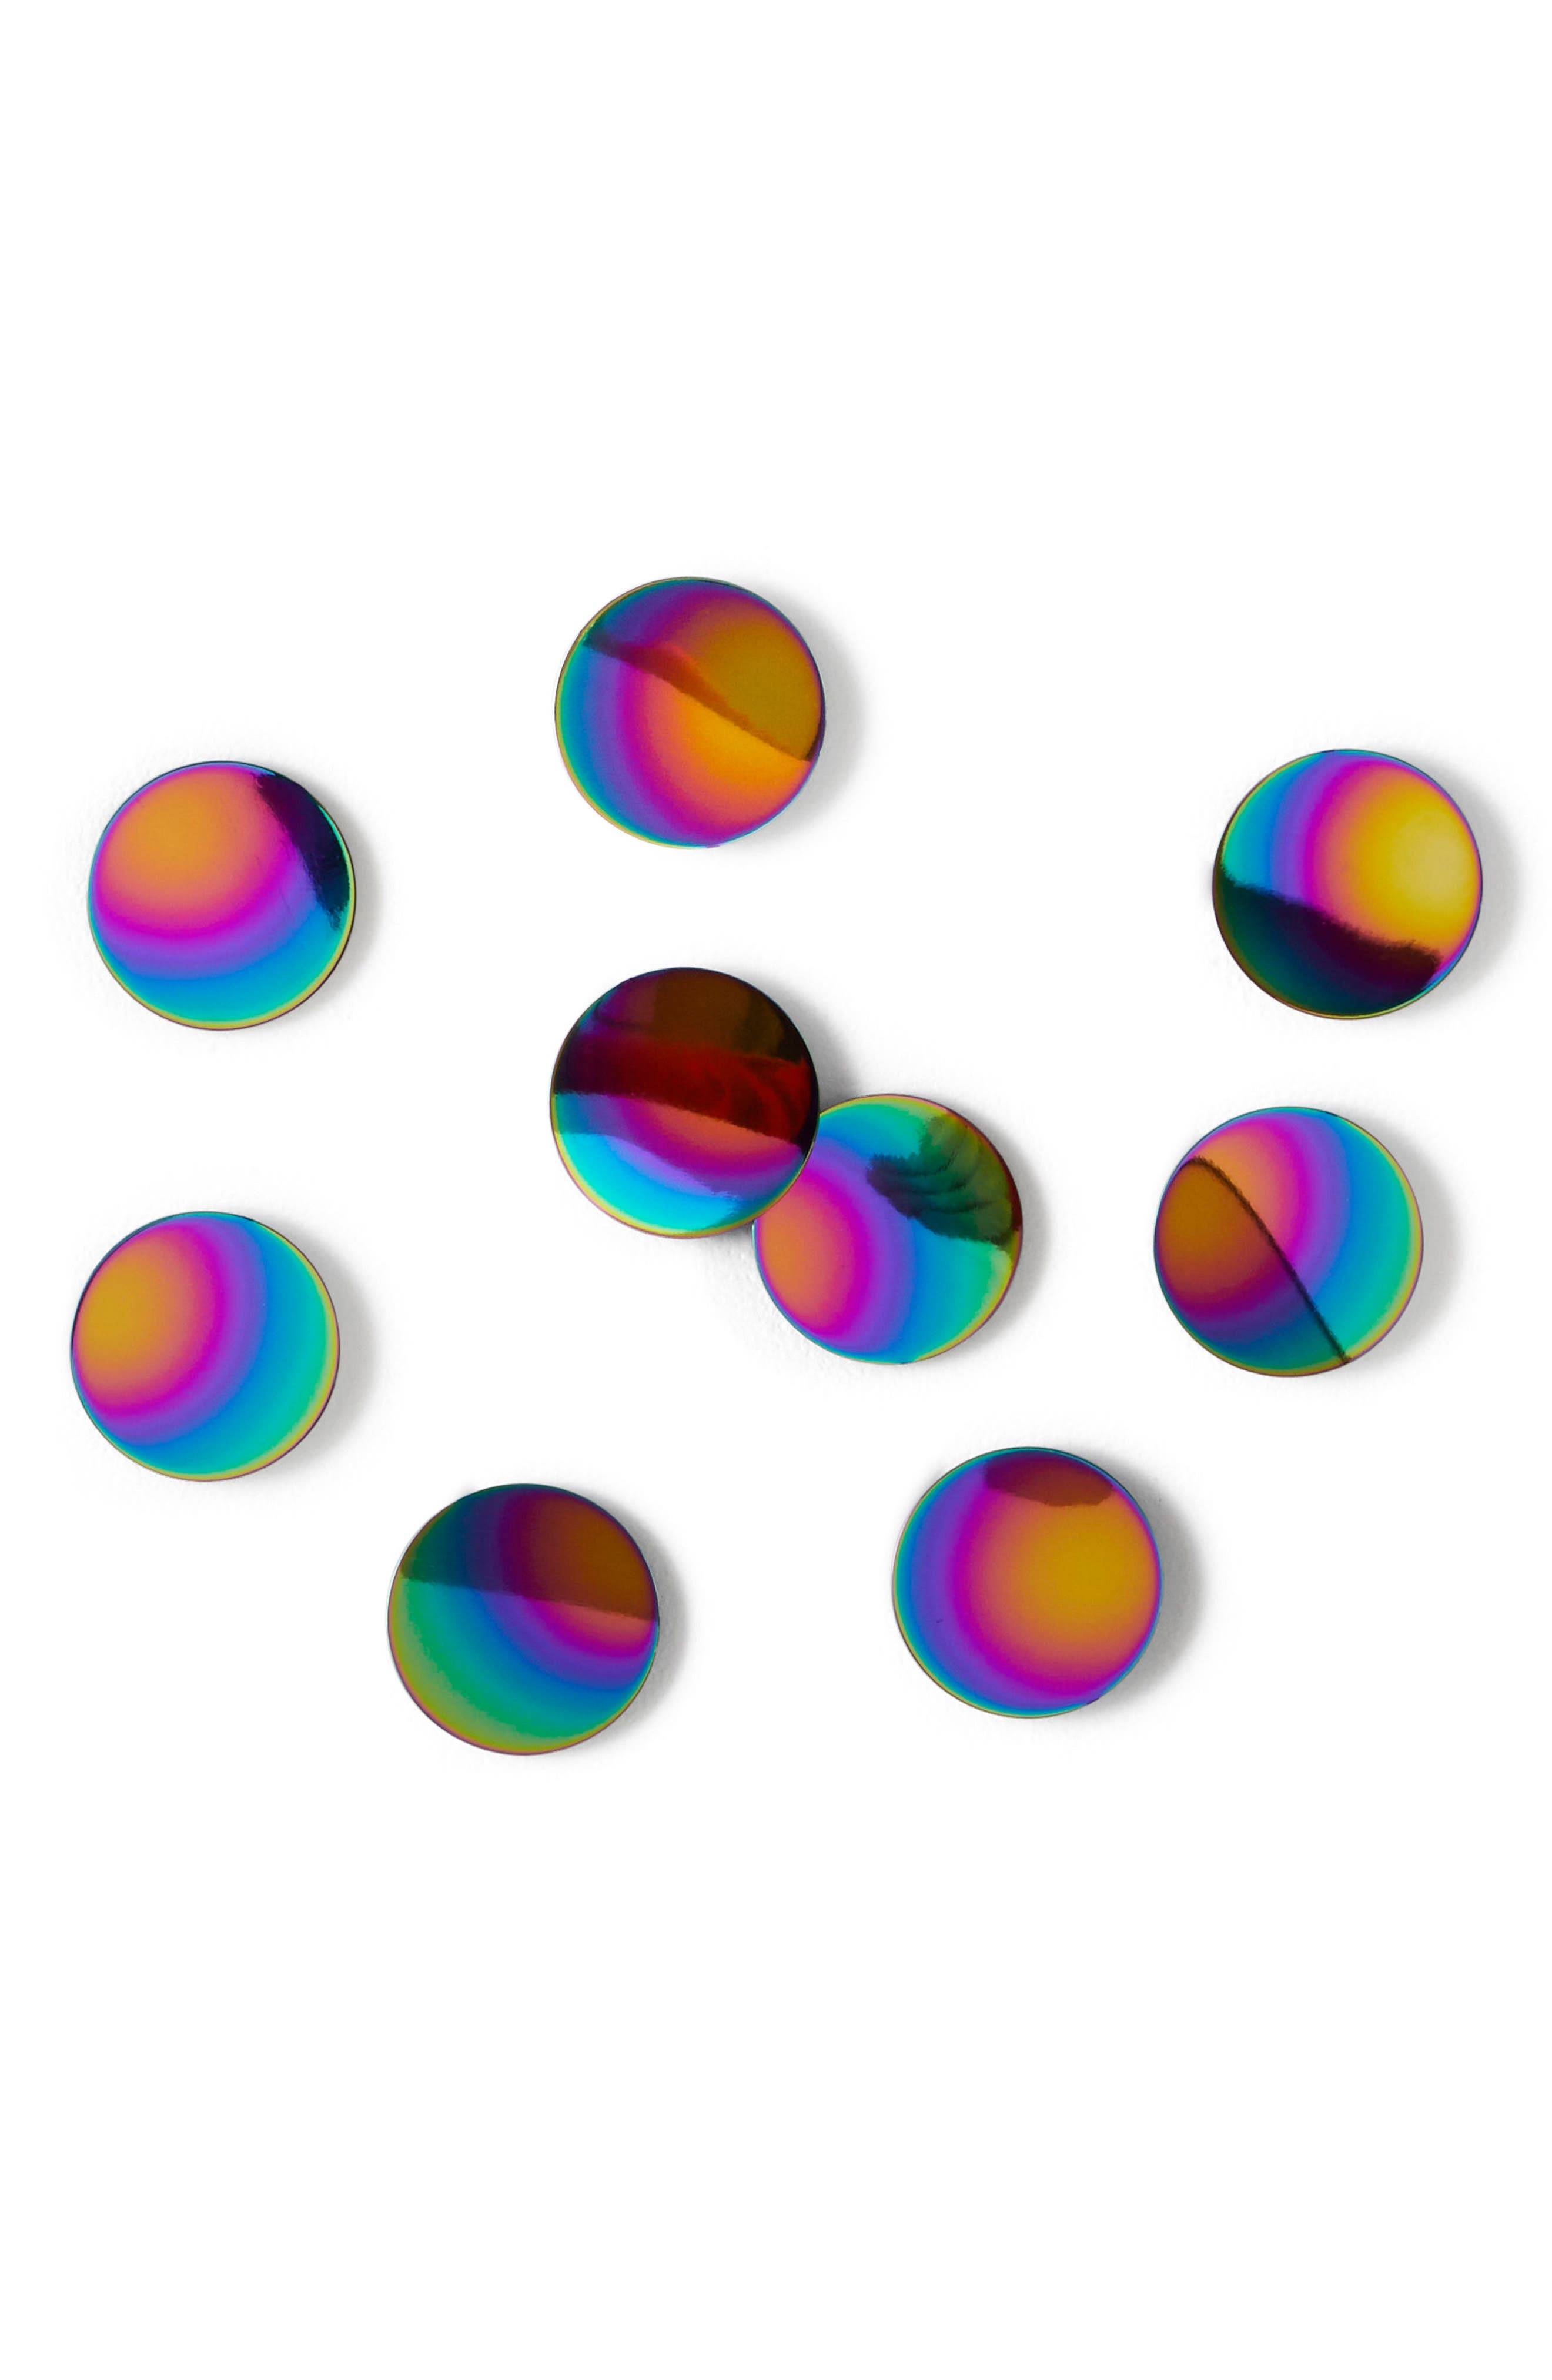 3D Confetti Dot Set of 10 Wall Decals,                             Main thumbnail 1, color,                             400